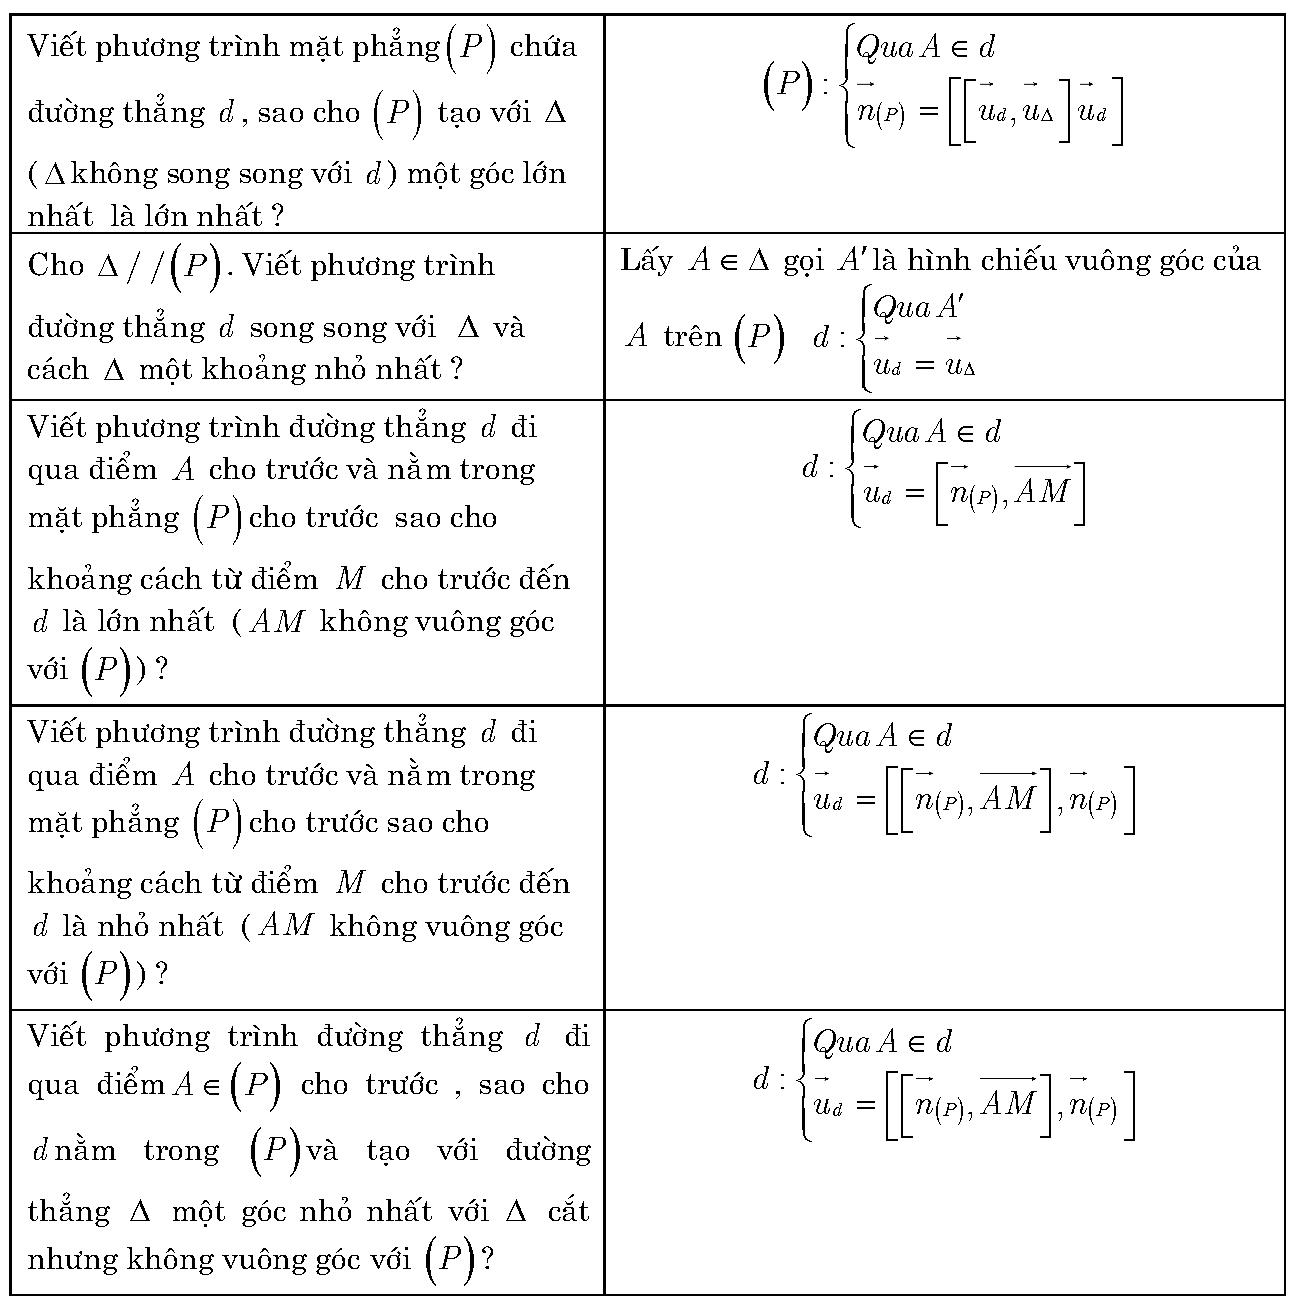 hinh-hoc-khong-gian-12-41-png.1996